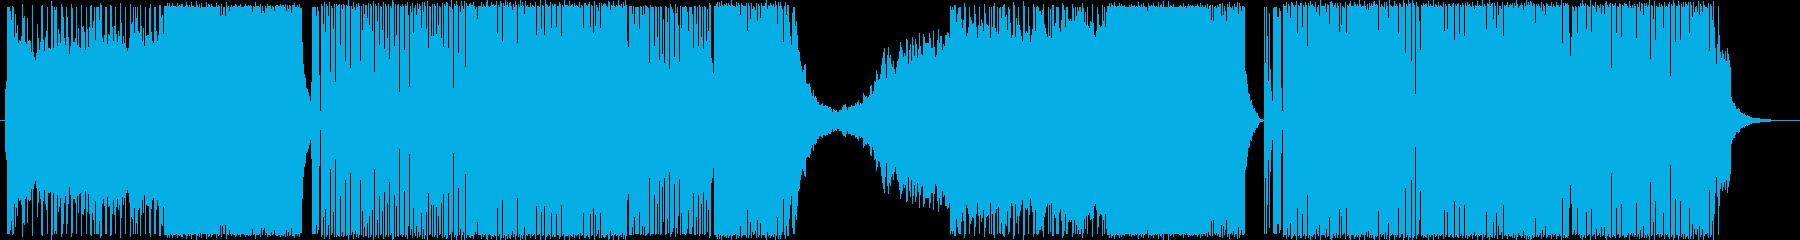 BassHouse/DeepHouseの再生済みの波形